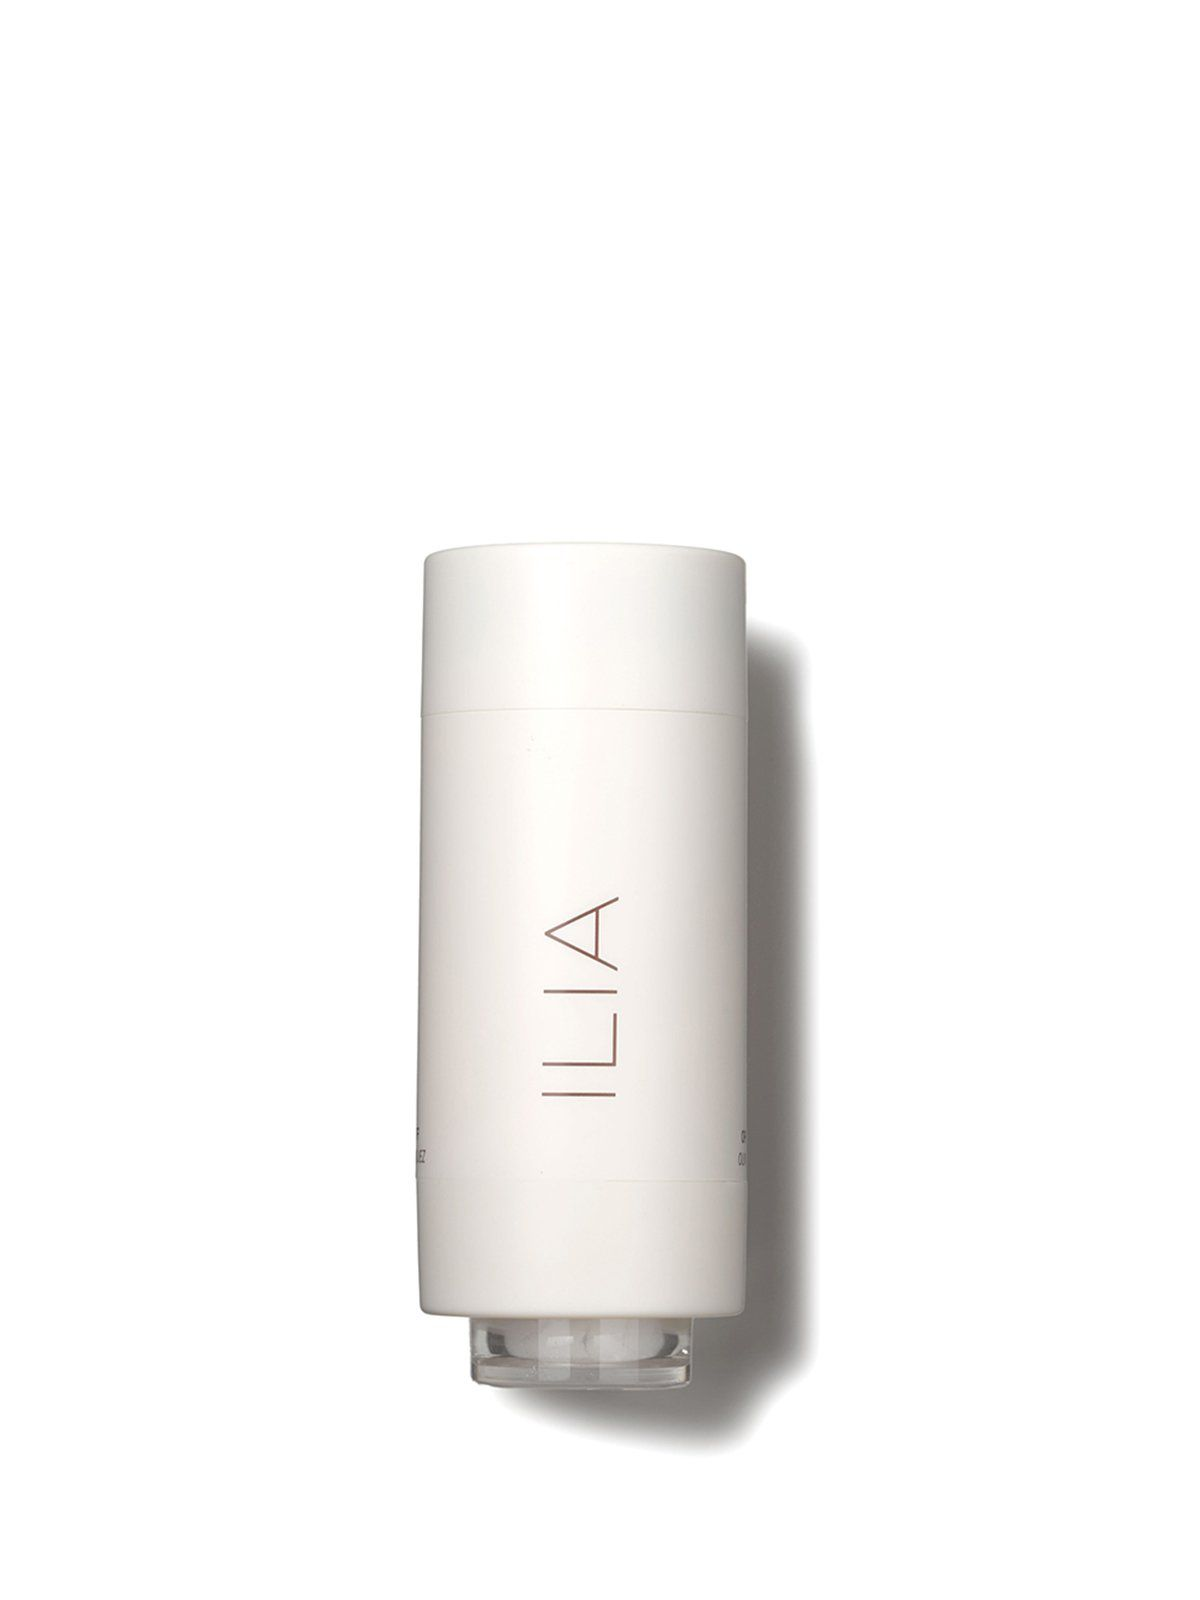 ILIA Moondance Radiant Translucent Powder SPF 20